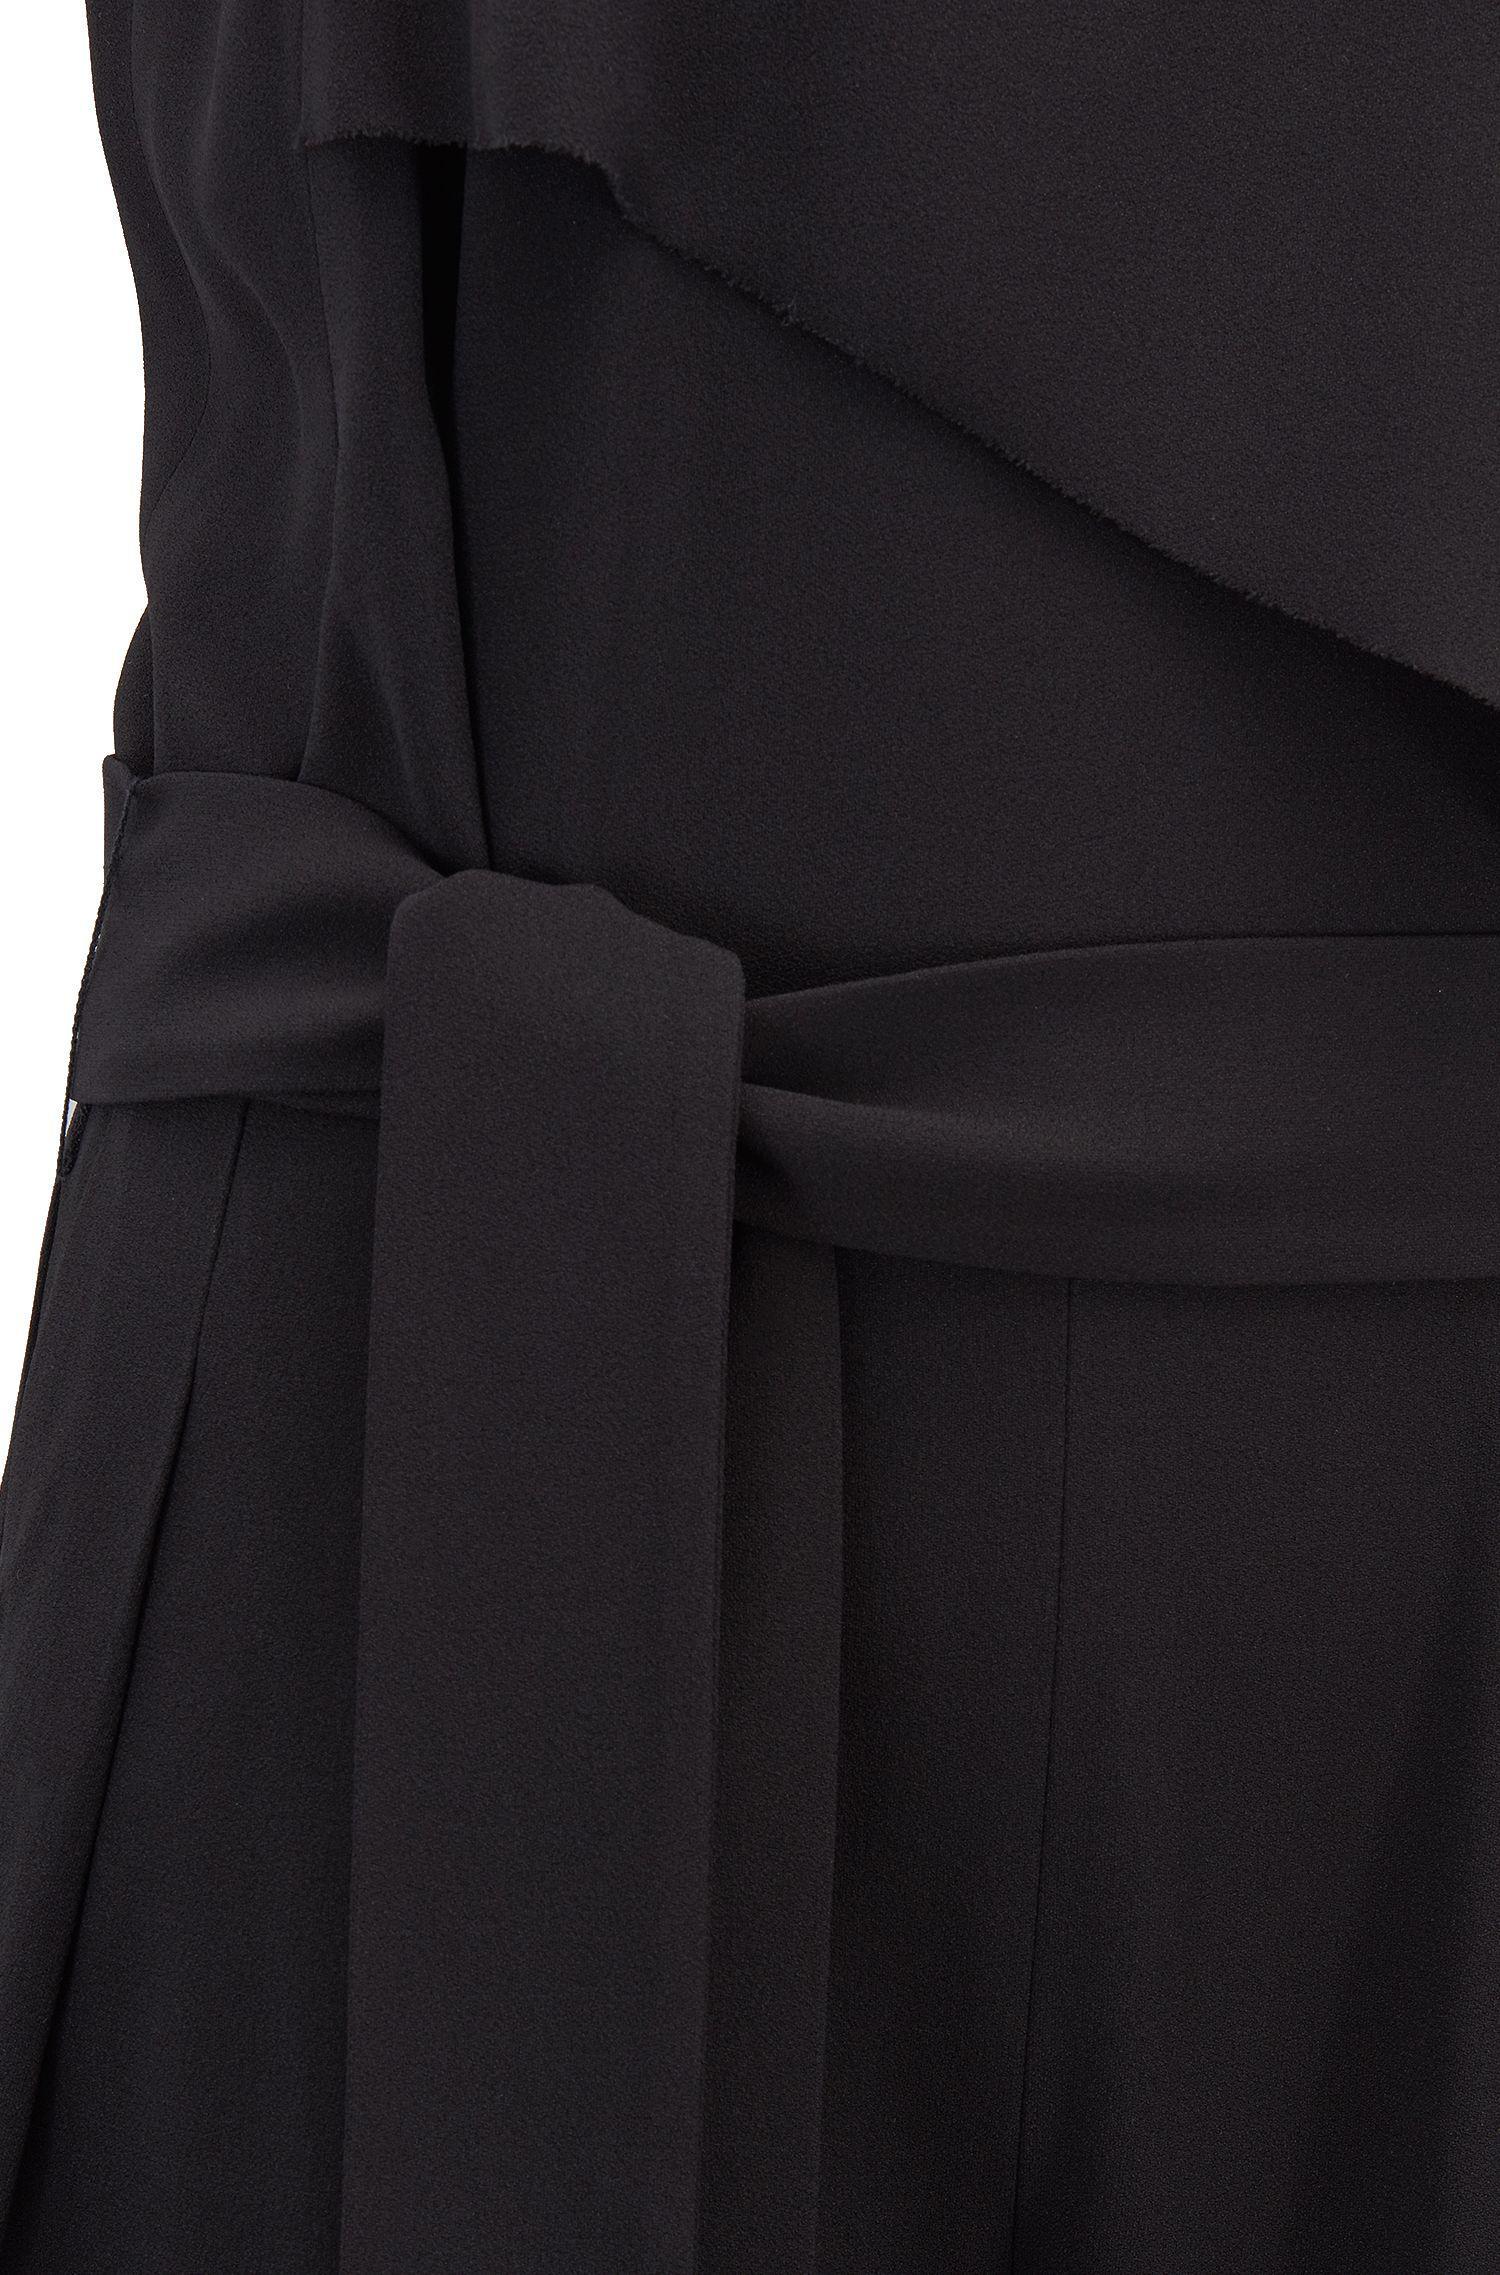 72f20b0f2dc BOSS - Black Tuxedo-style Jumpsuit In Satinback Crepe - Lyst. View  fullscreen